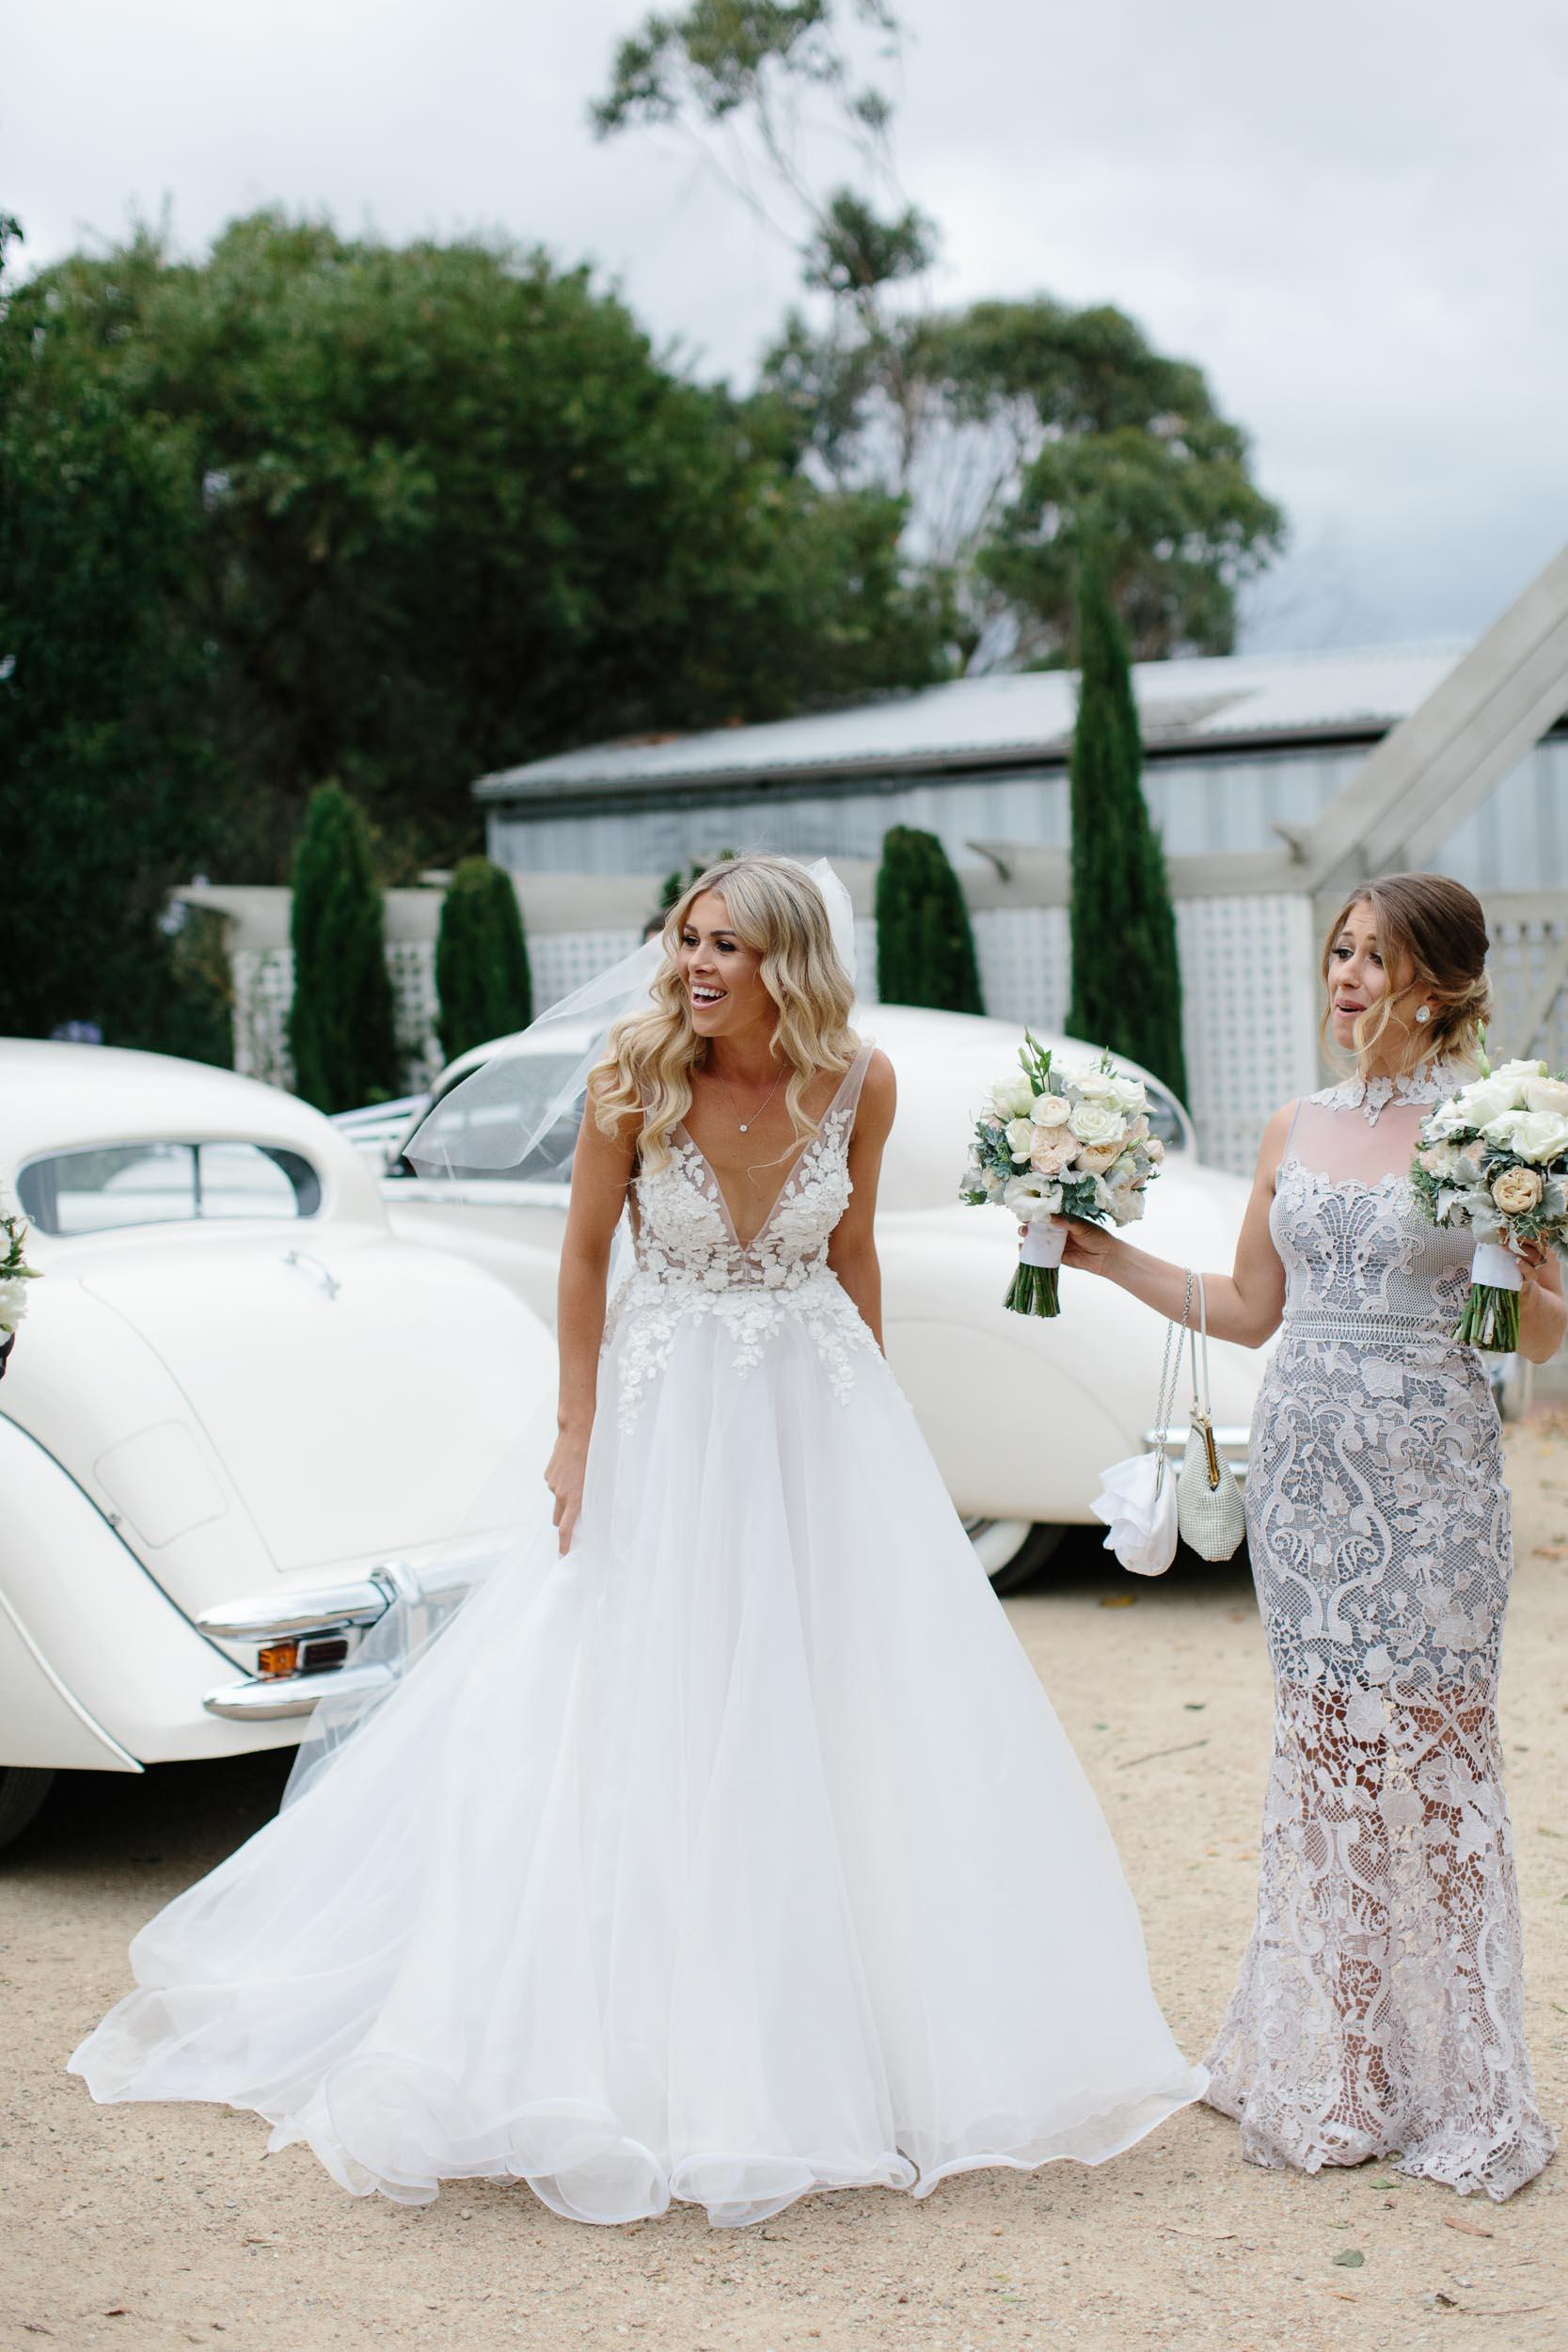 Kas-Richards-Mornington-Peninsula-Private-Property-Wedding-Marianna-Hardwick-Gown-187.jpg